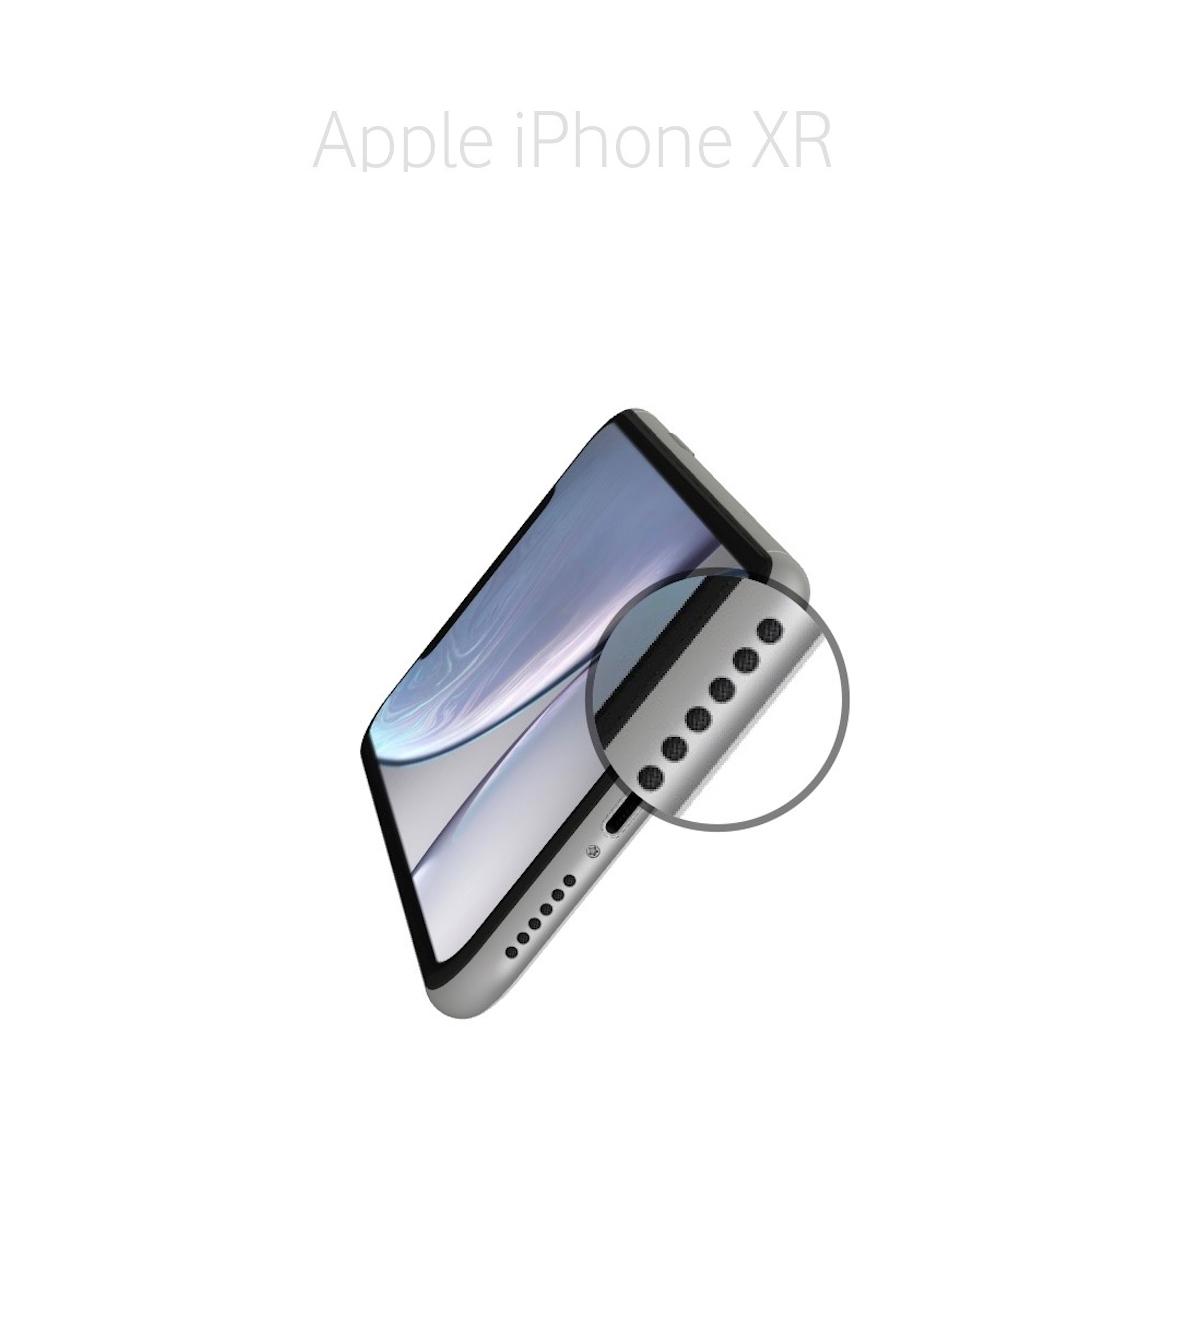 Laga högtalare iPhone XR